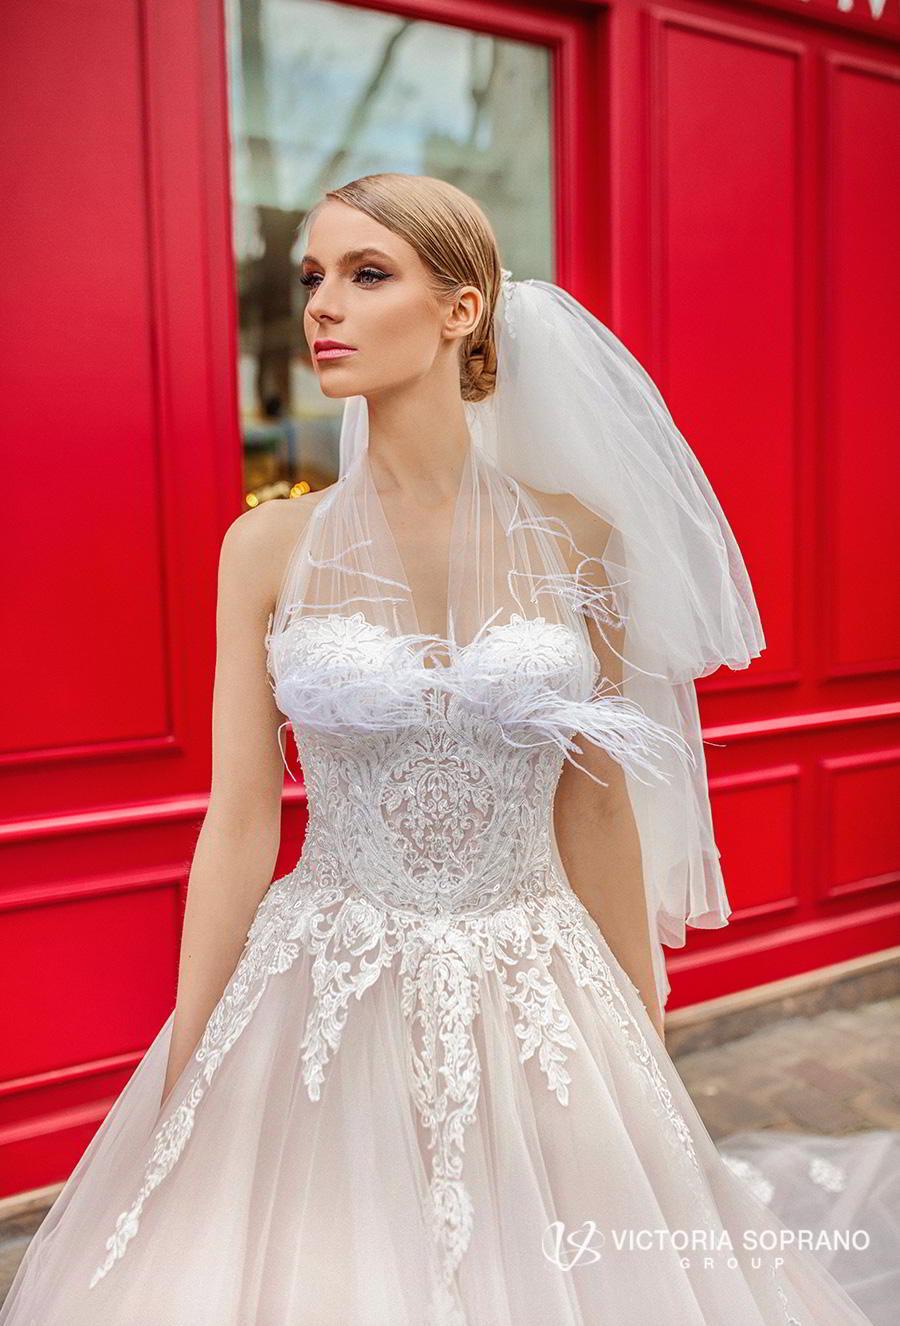 victoria soprano 2019 bridal sleeveless sheer strap sweetheart neckline heavily embellished bodice princess blush ball gown wedding dress royal train (jakline) zv